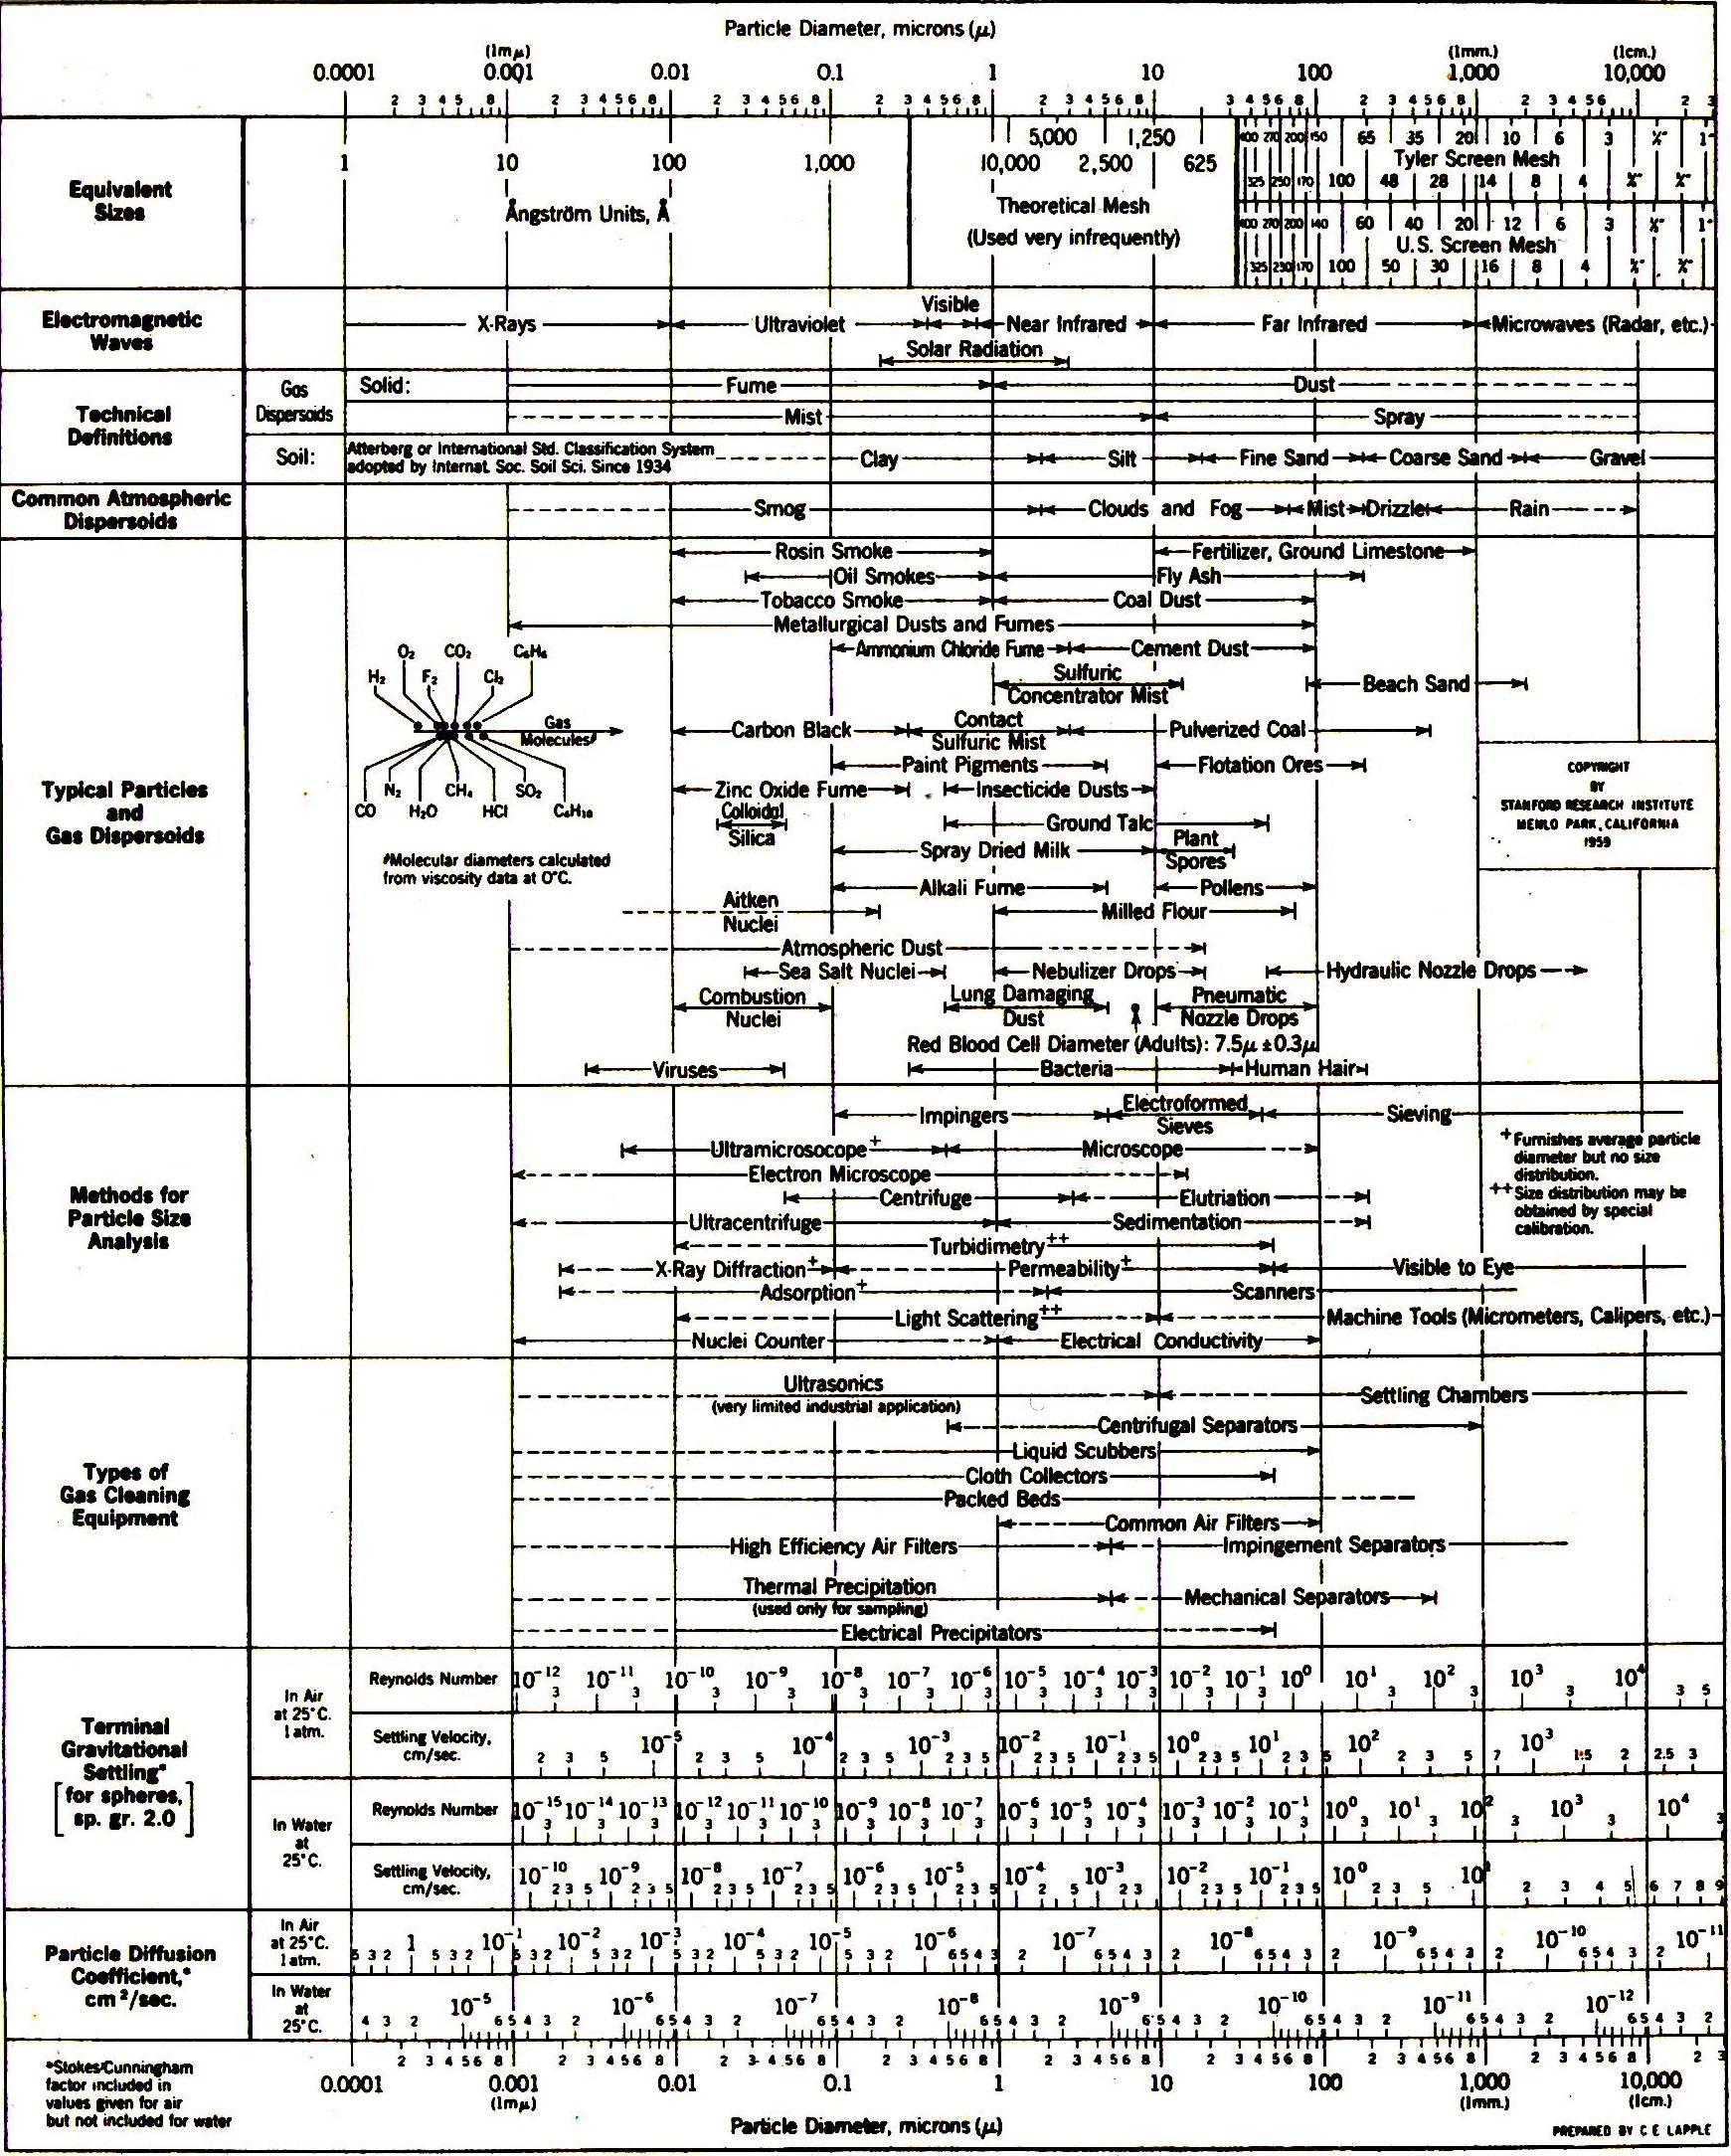 جدول خواص ذرات مختلف